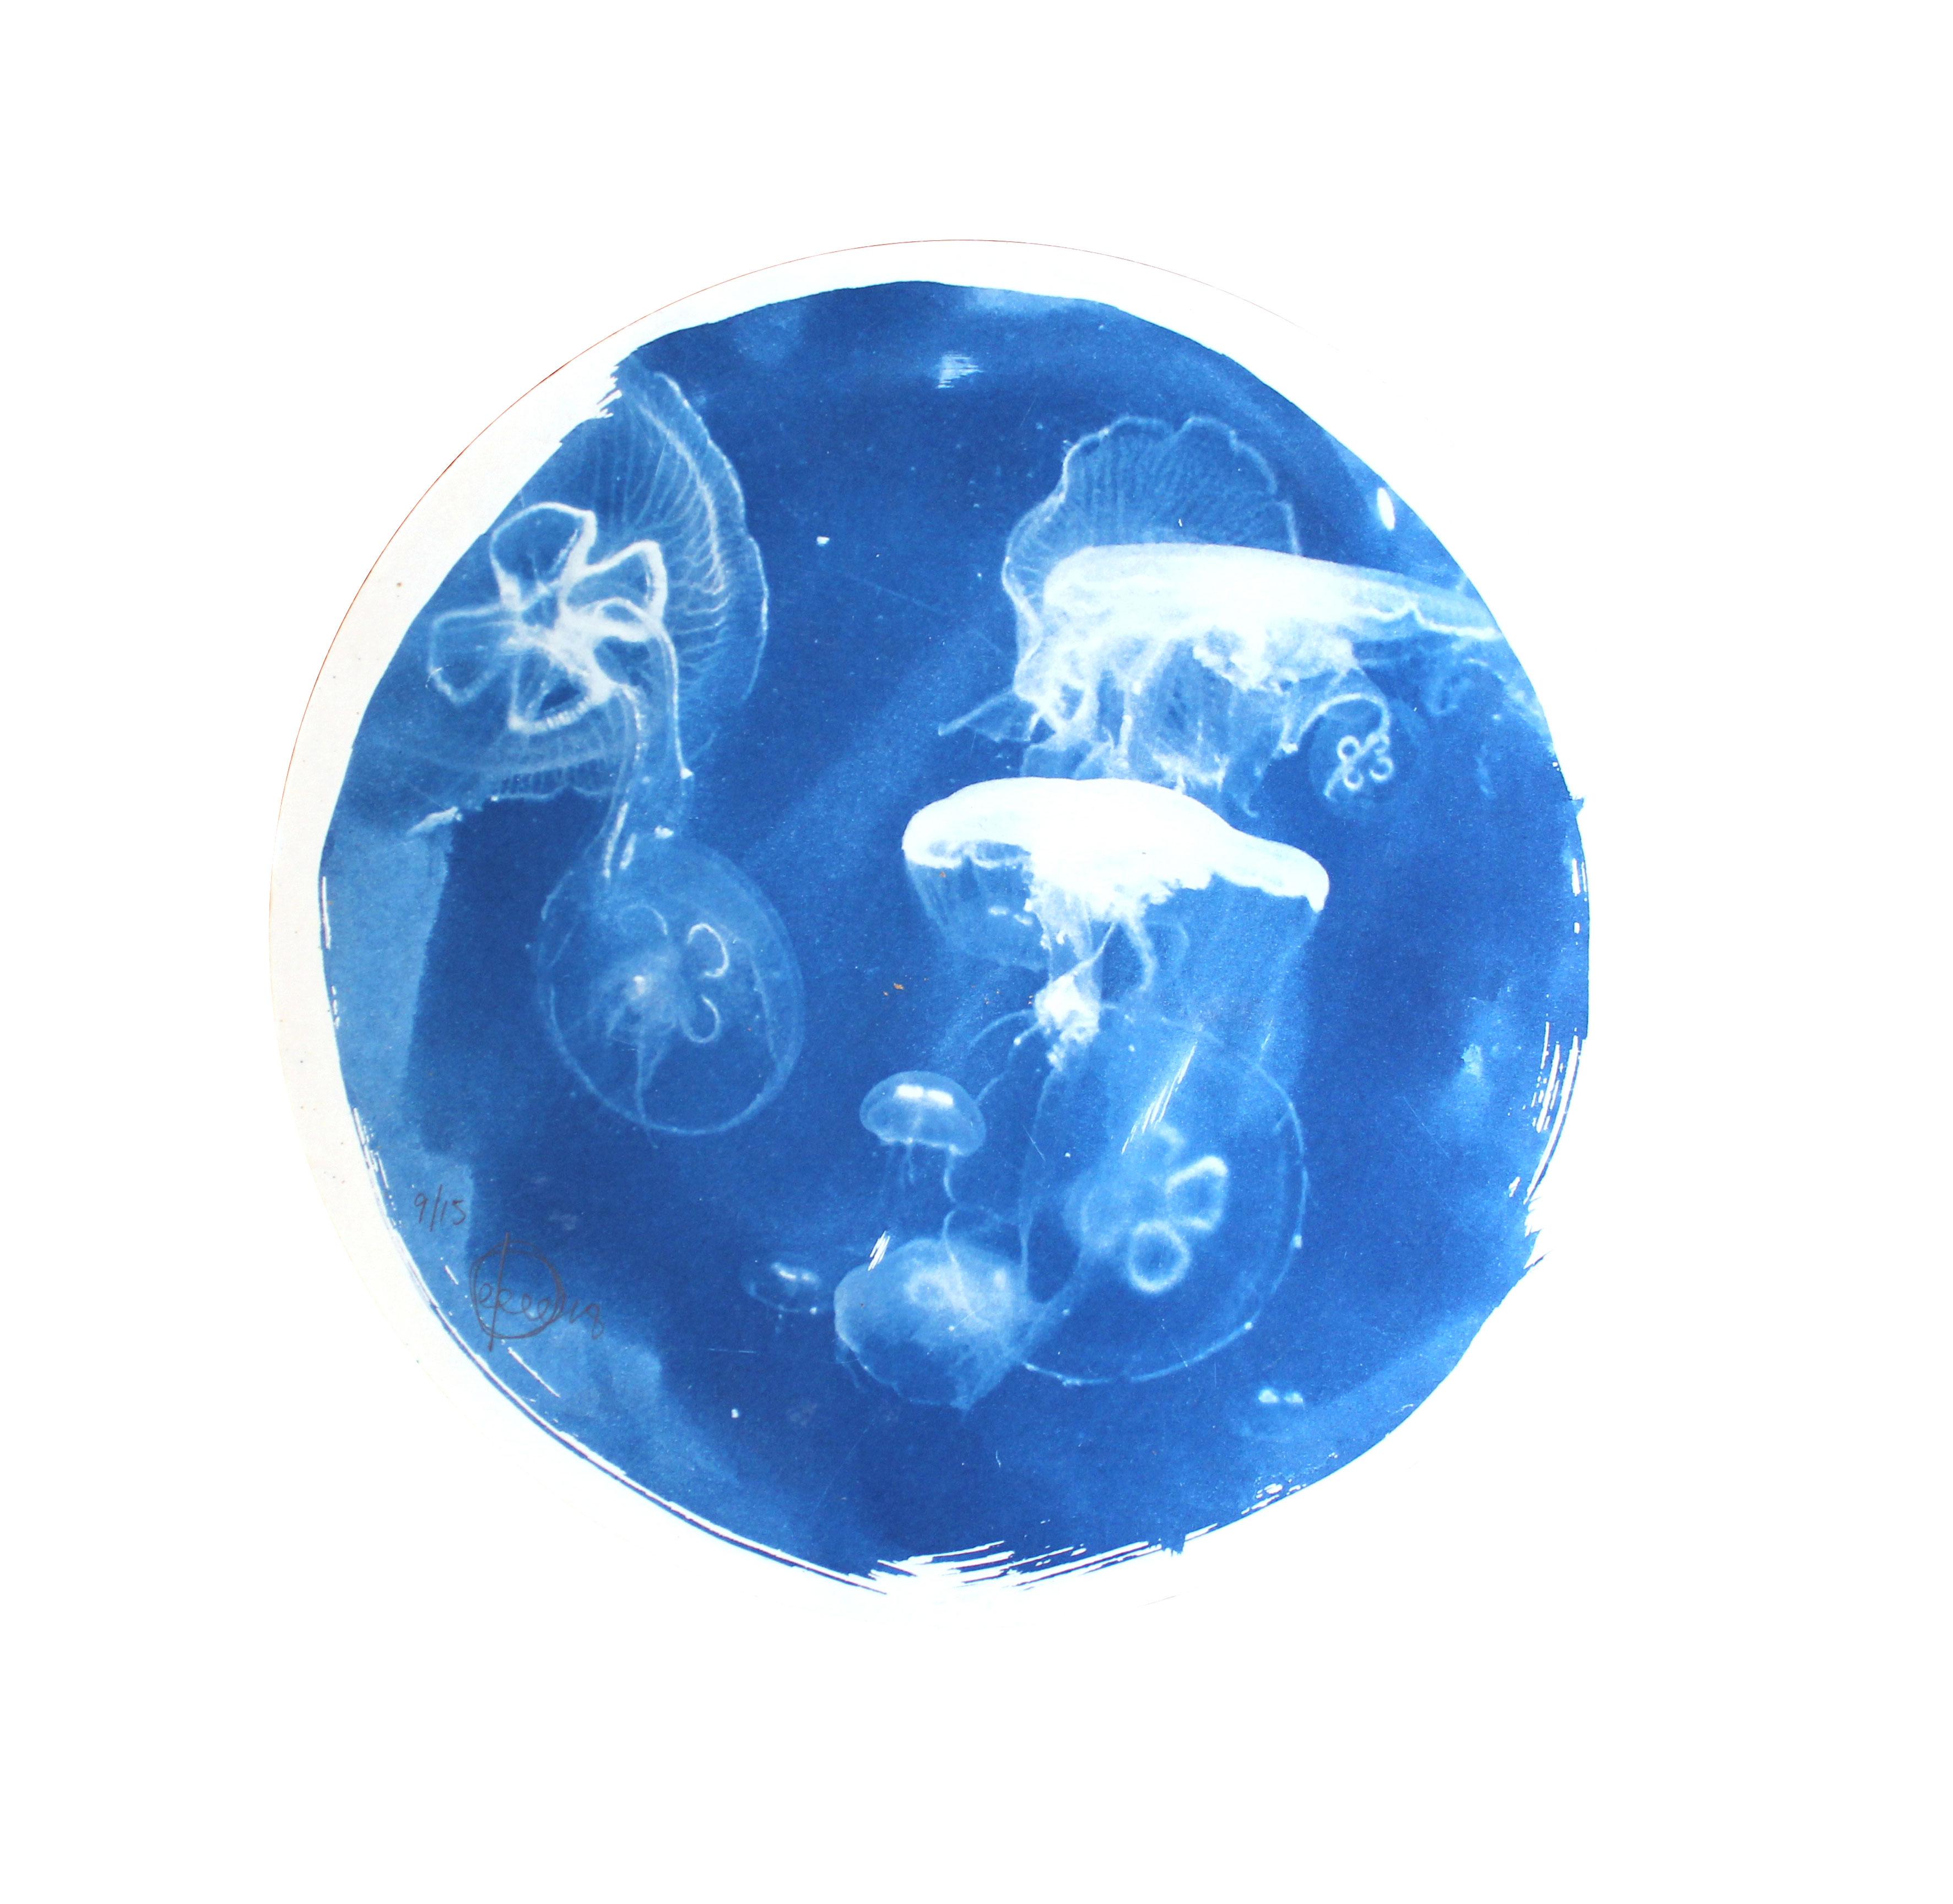 cyanotype-print-craig-keenan-blueprint-j